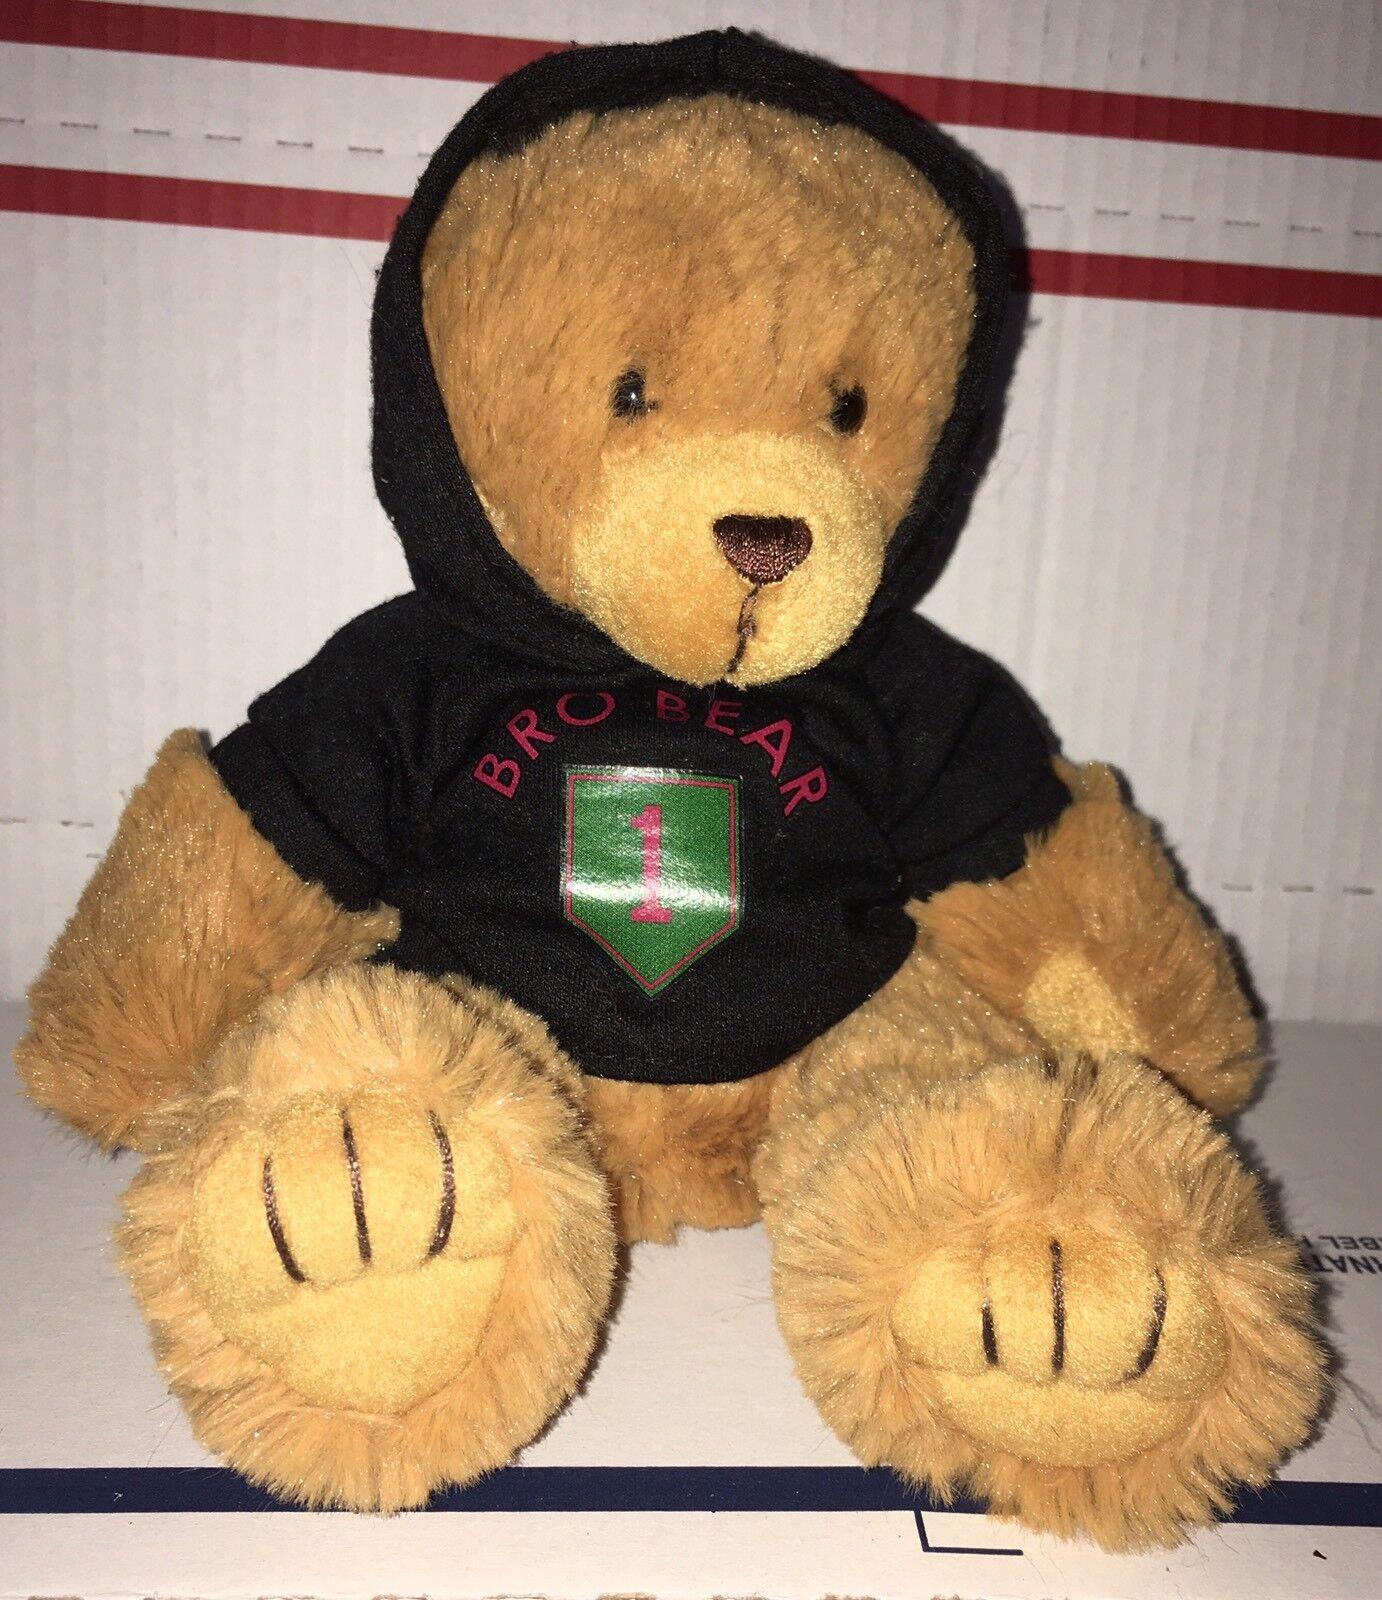 Artistic toys 6 inch plush bro bear in hoodie